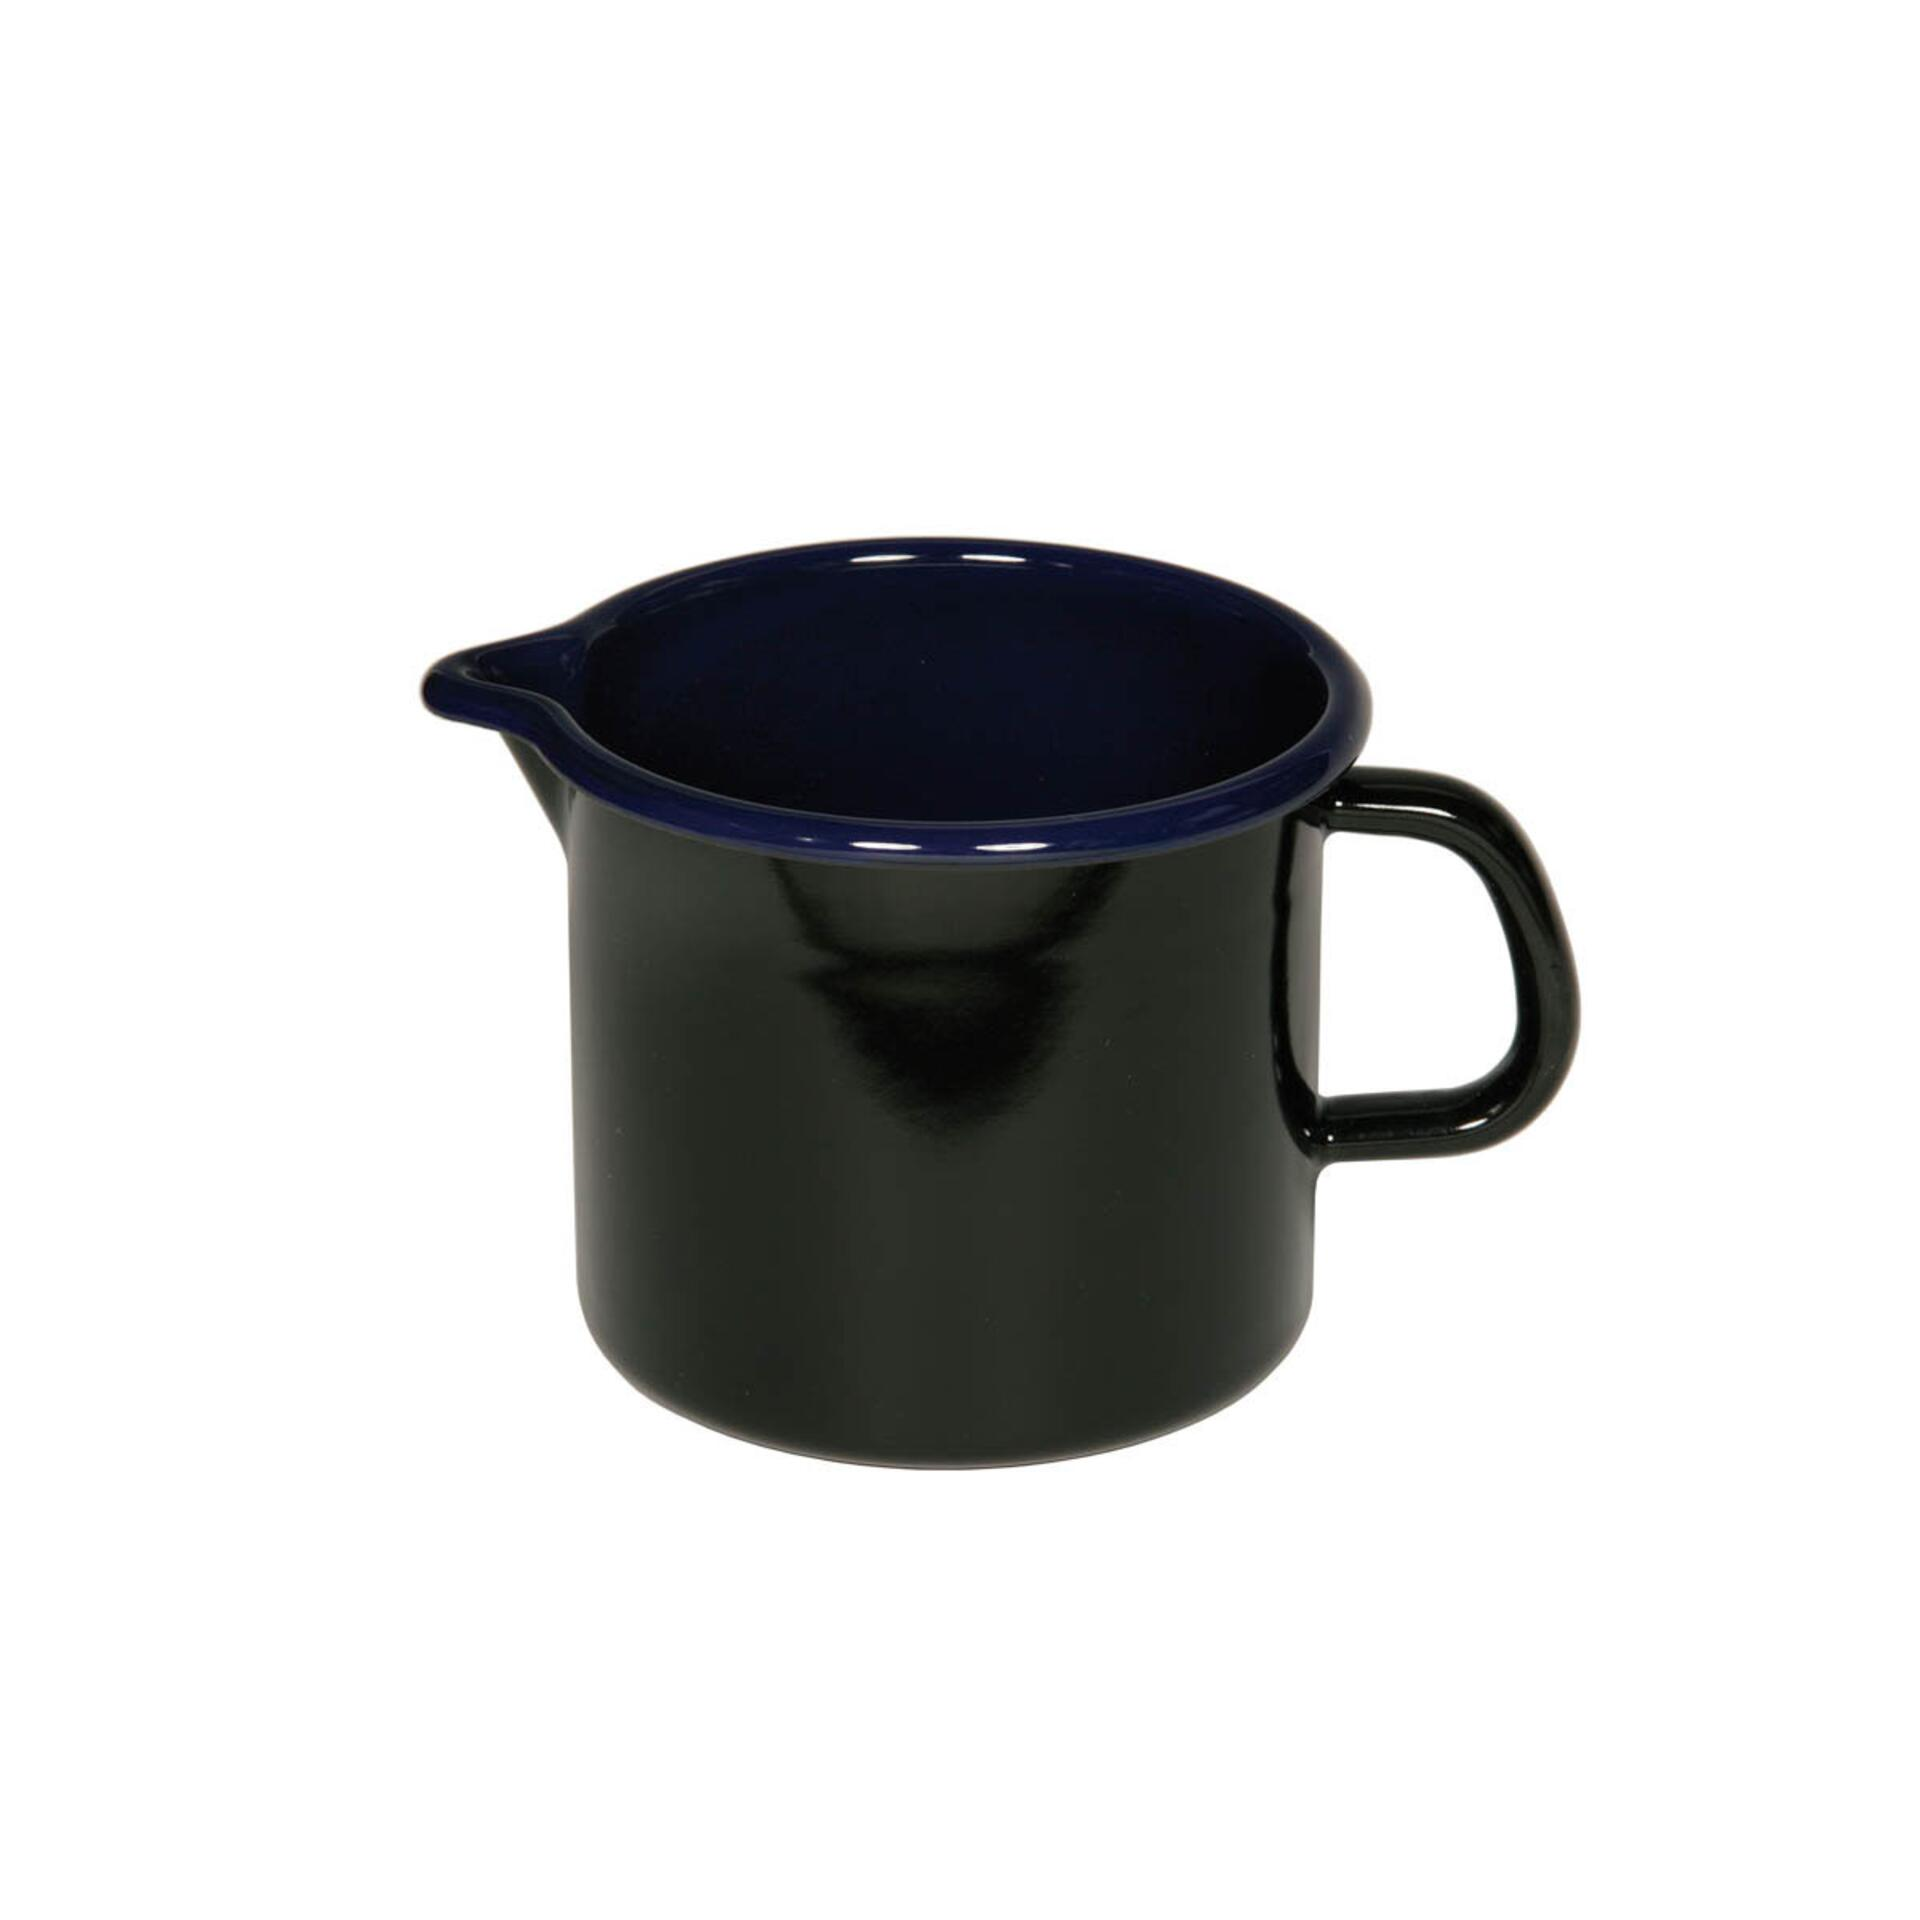 Riess Schnabeltopf 1,7 l Schwarz/blau